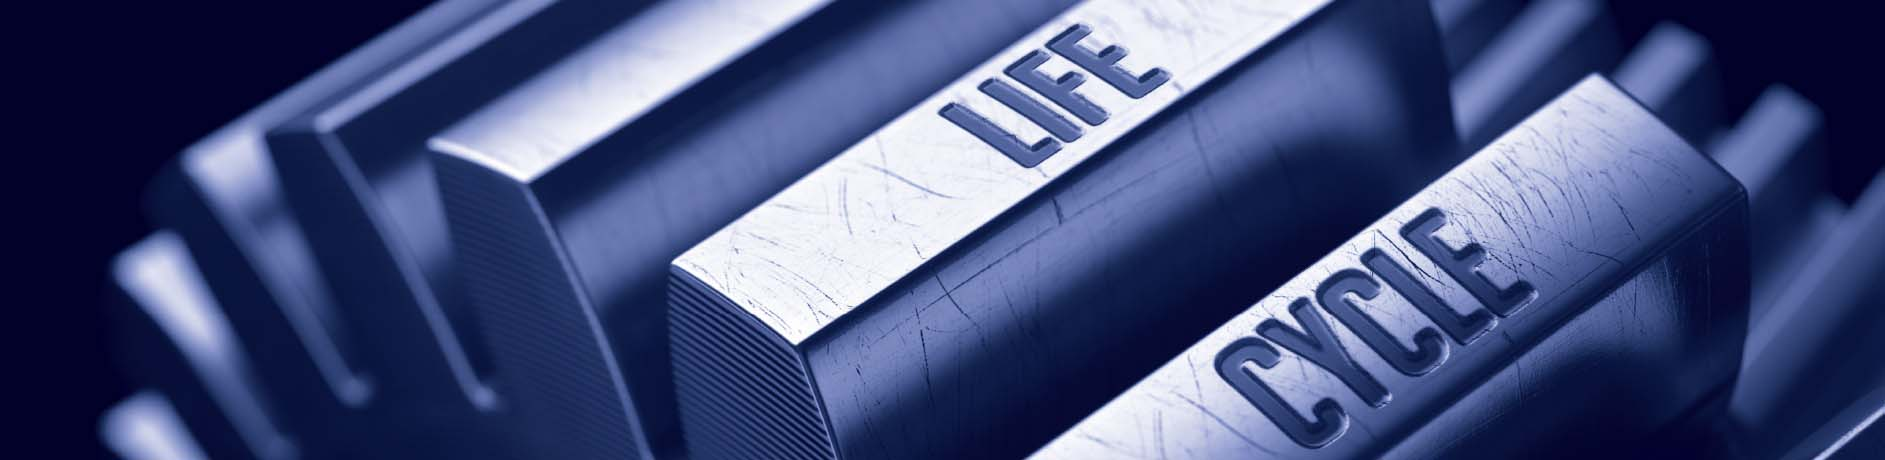 Life_Cycle_Banner_Image_1885x460.jpg